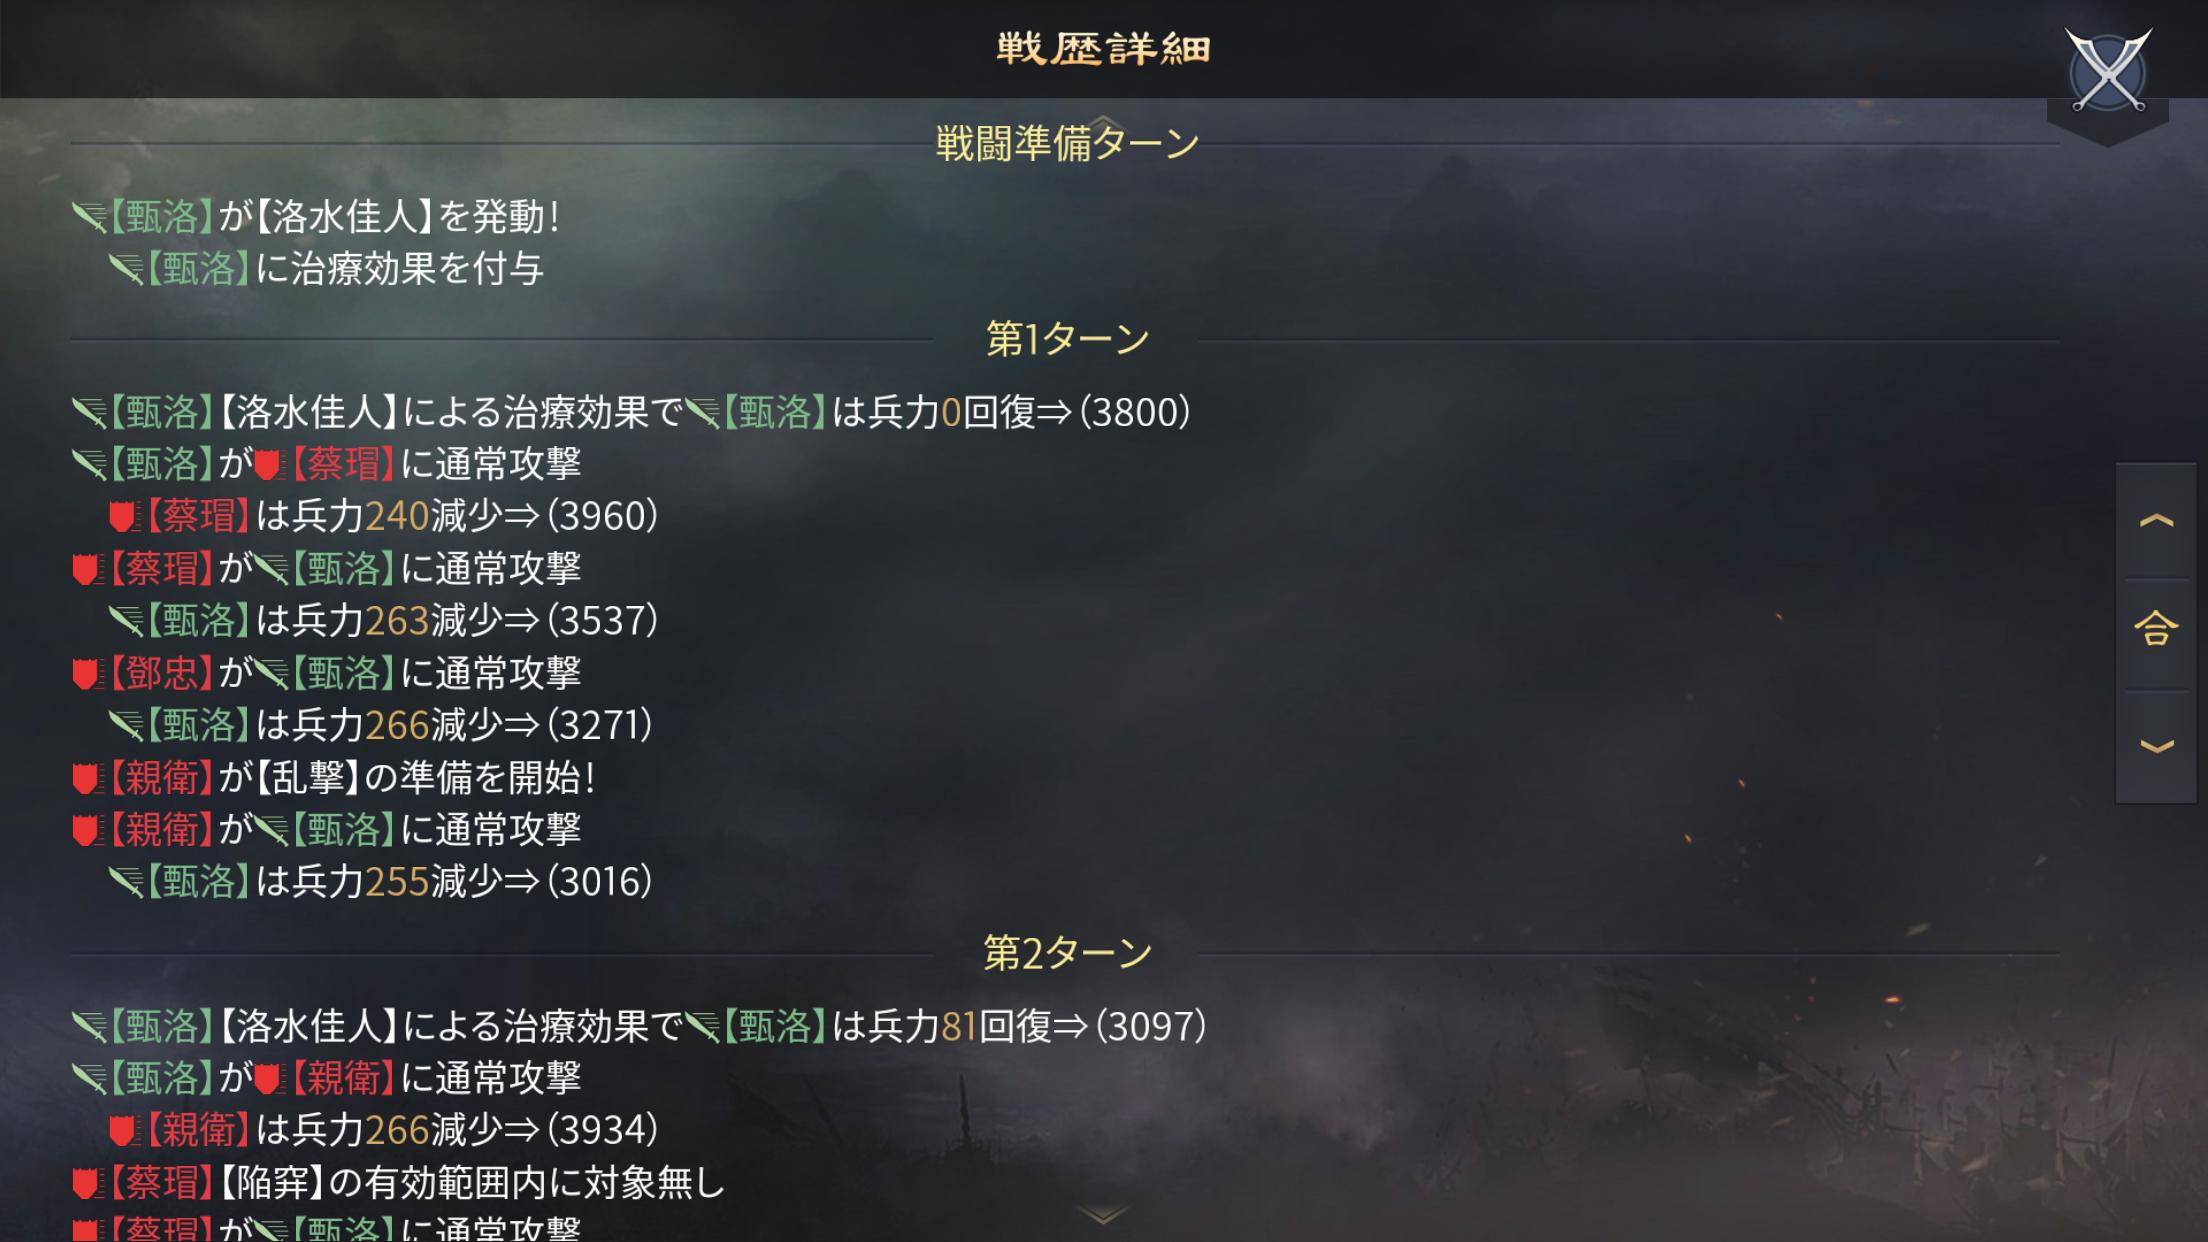 f:id:daisangokushimomimomi:20200327181135p:image